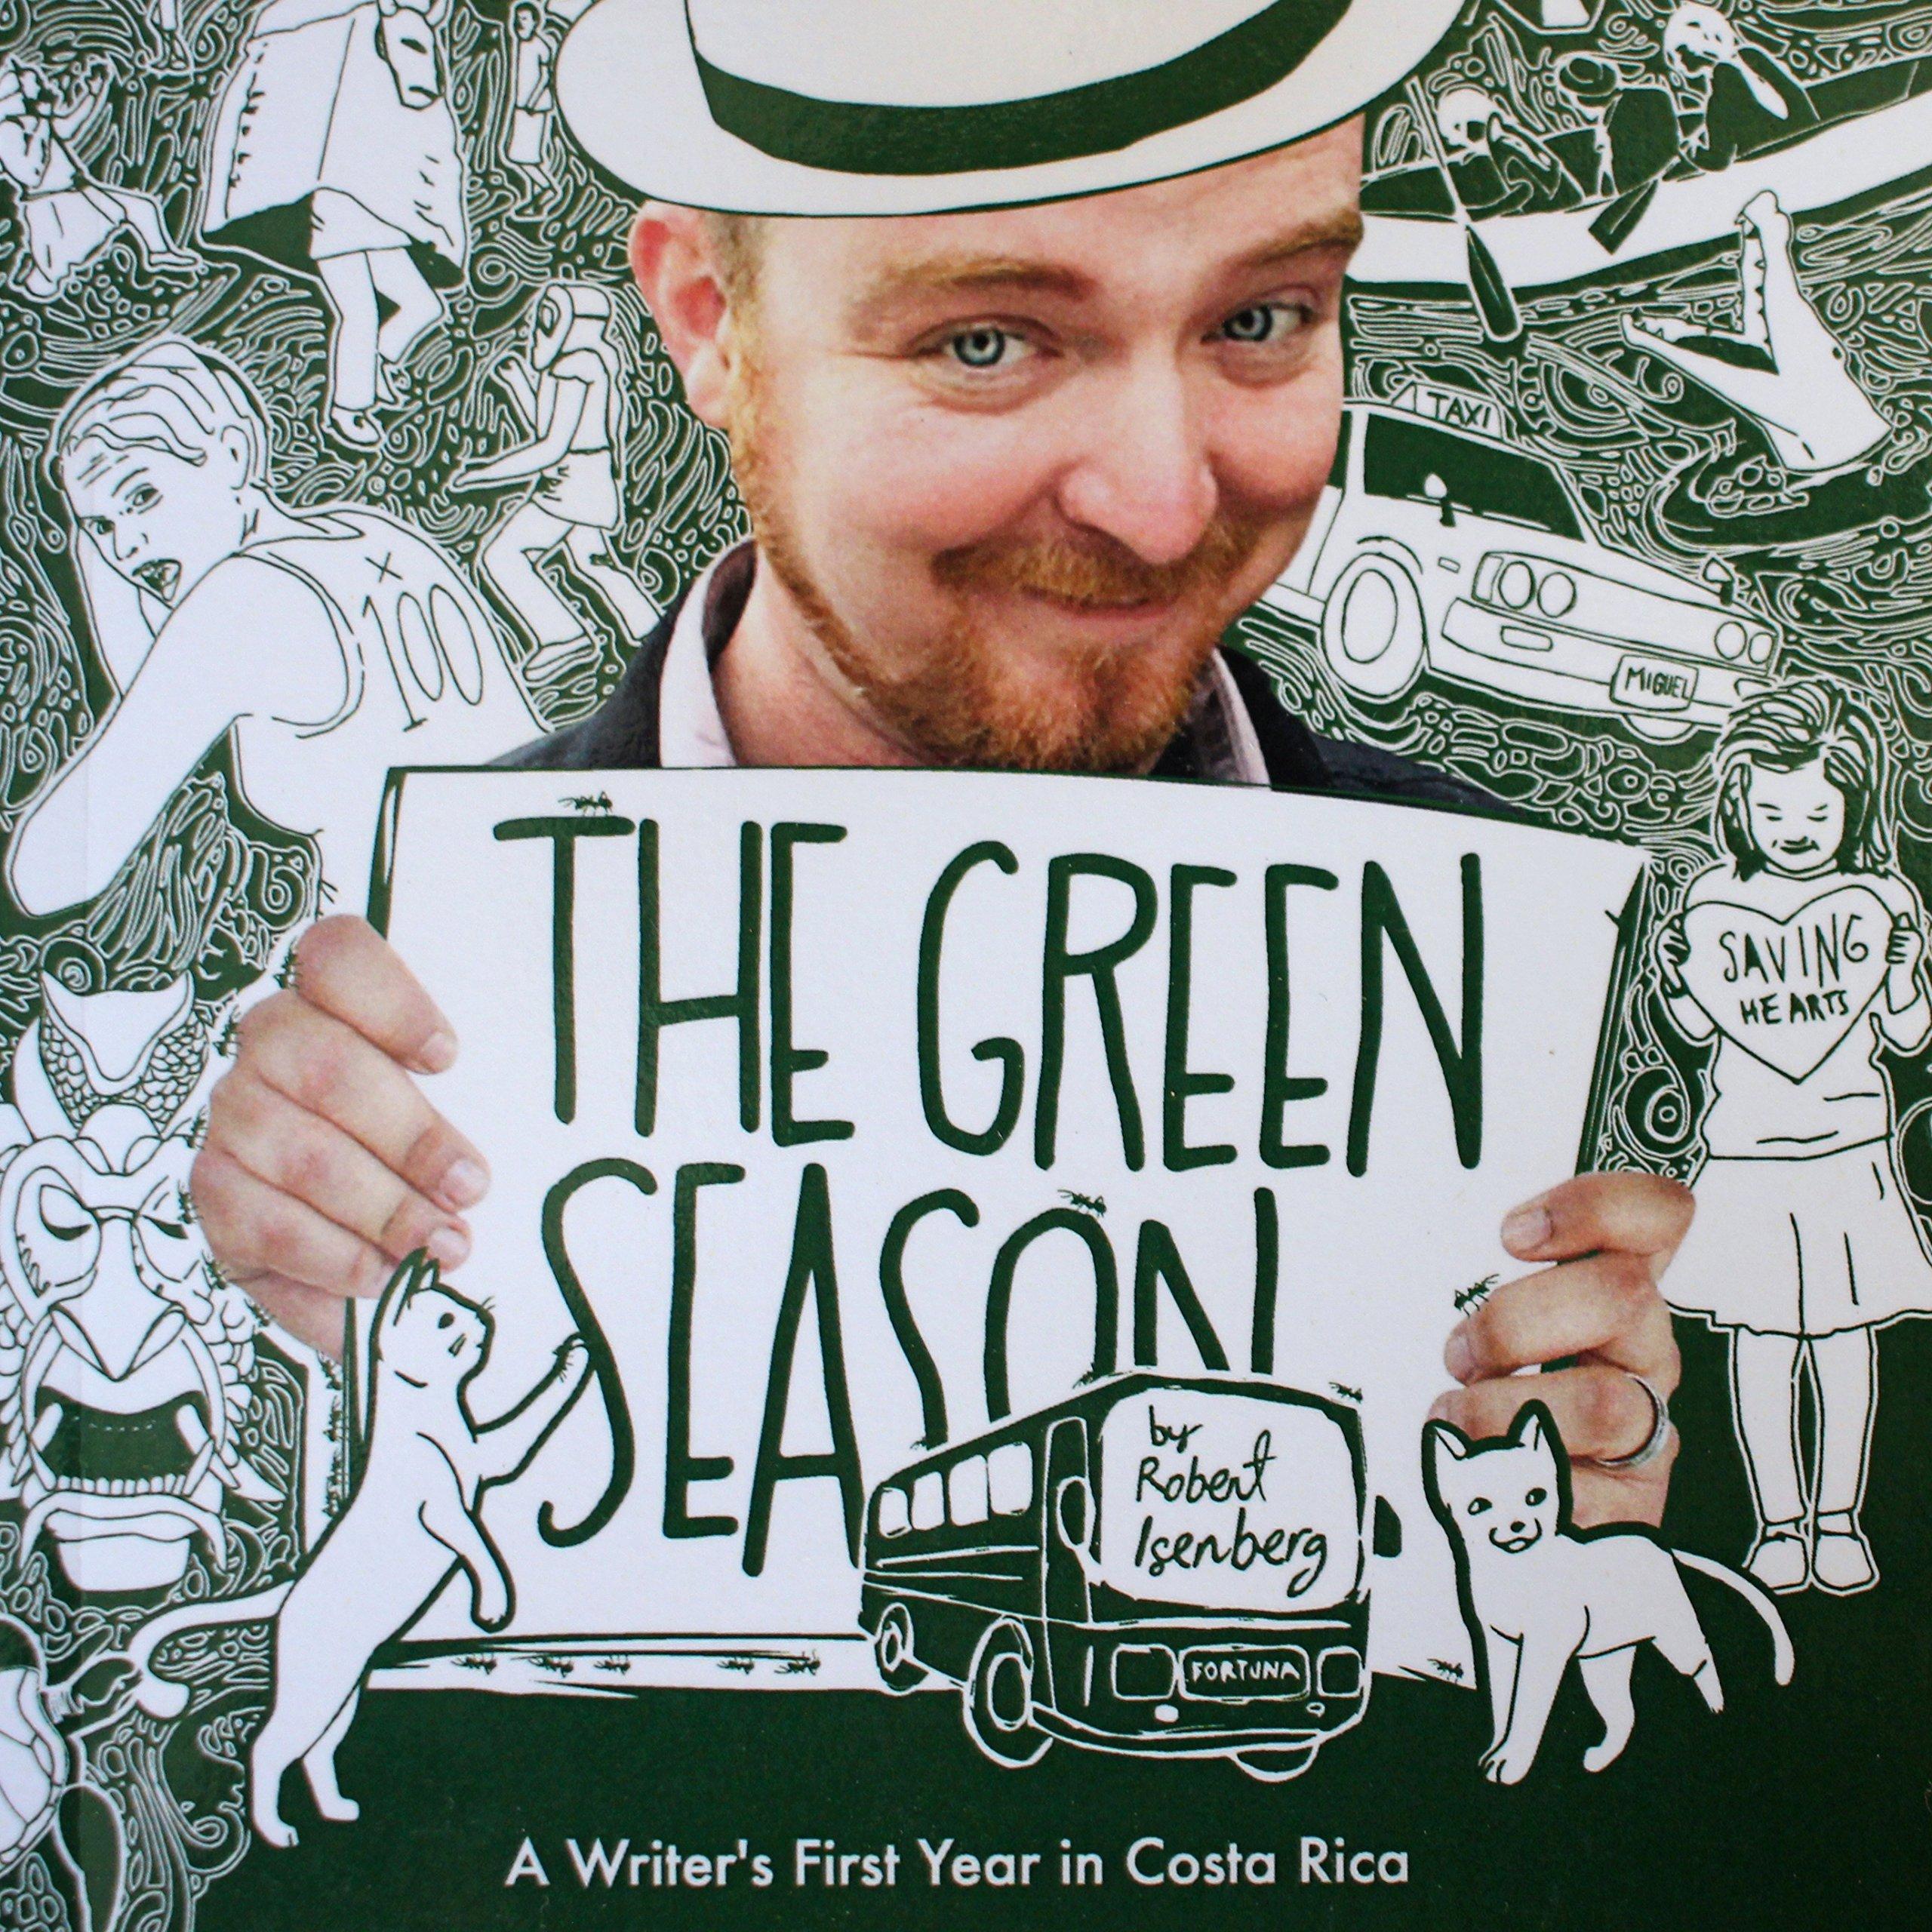 The Green Season